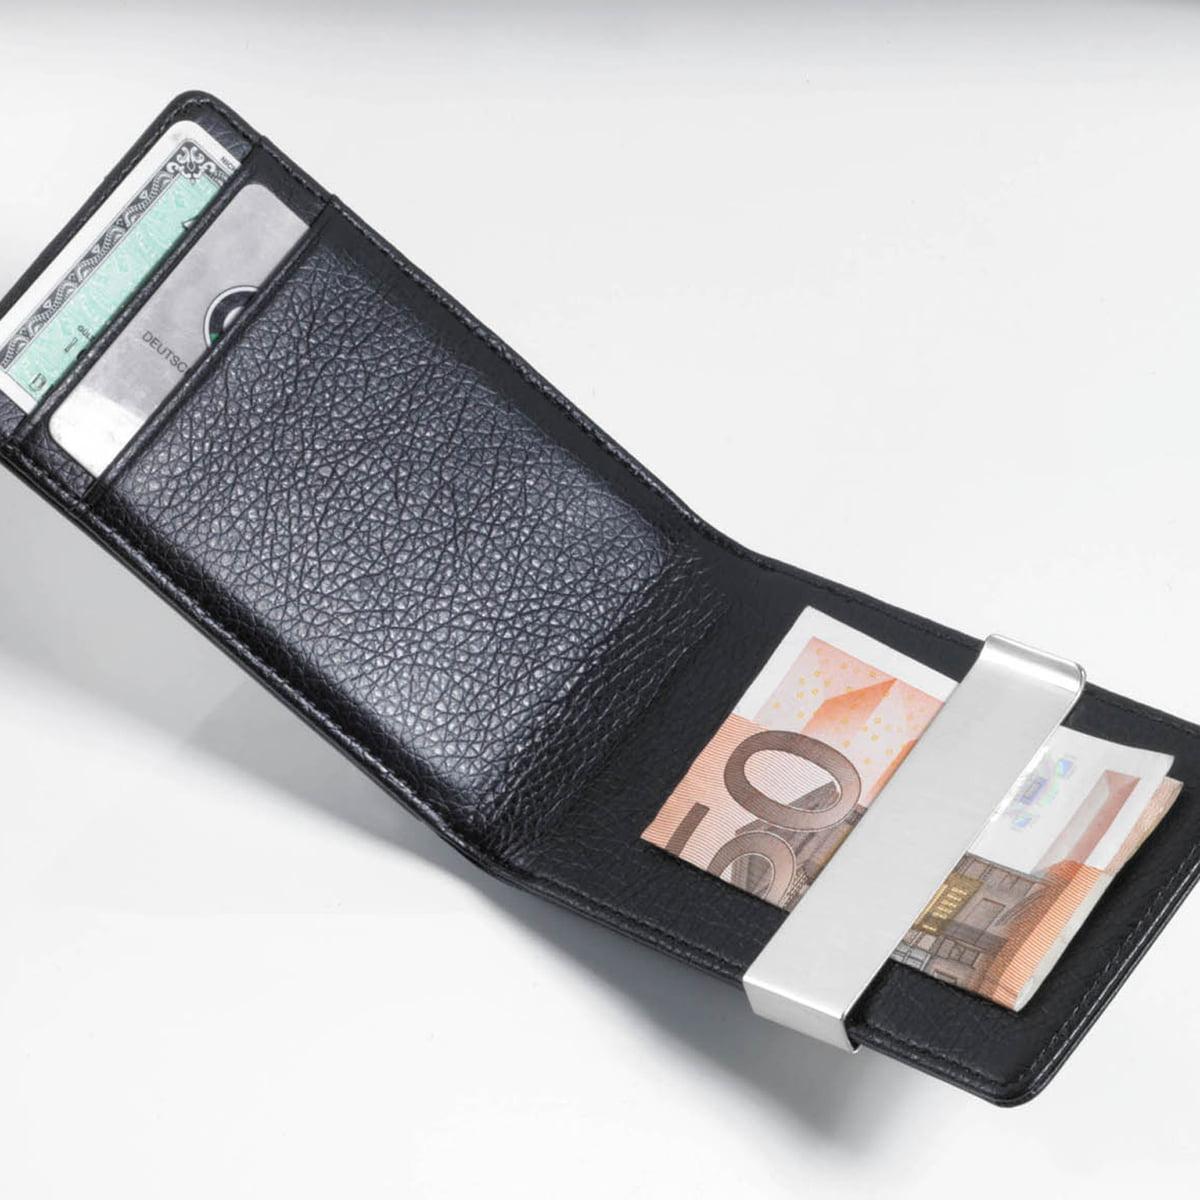 Midnight Credit Card Case | Troika | Shop